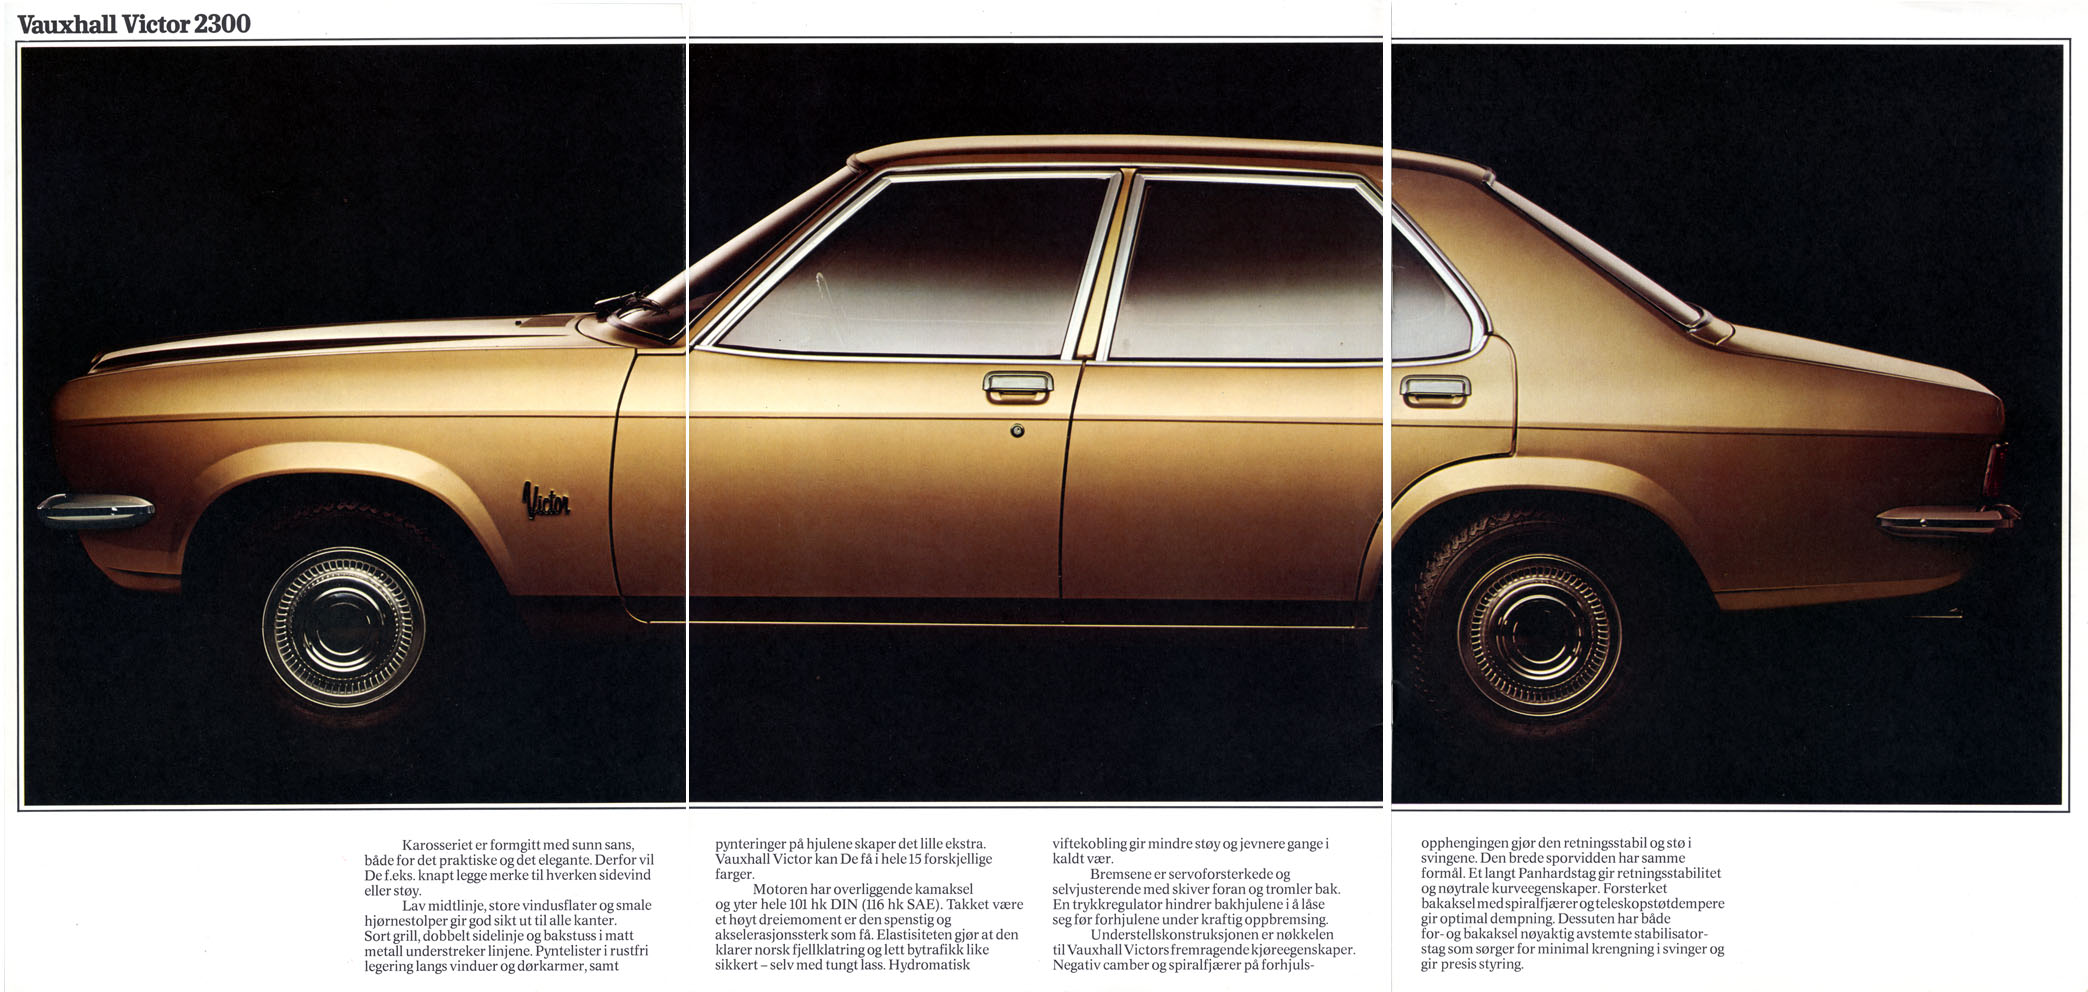 1974 Vauxhall Victor.